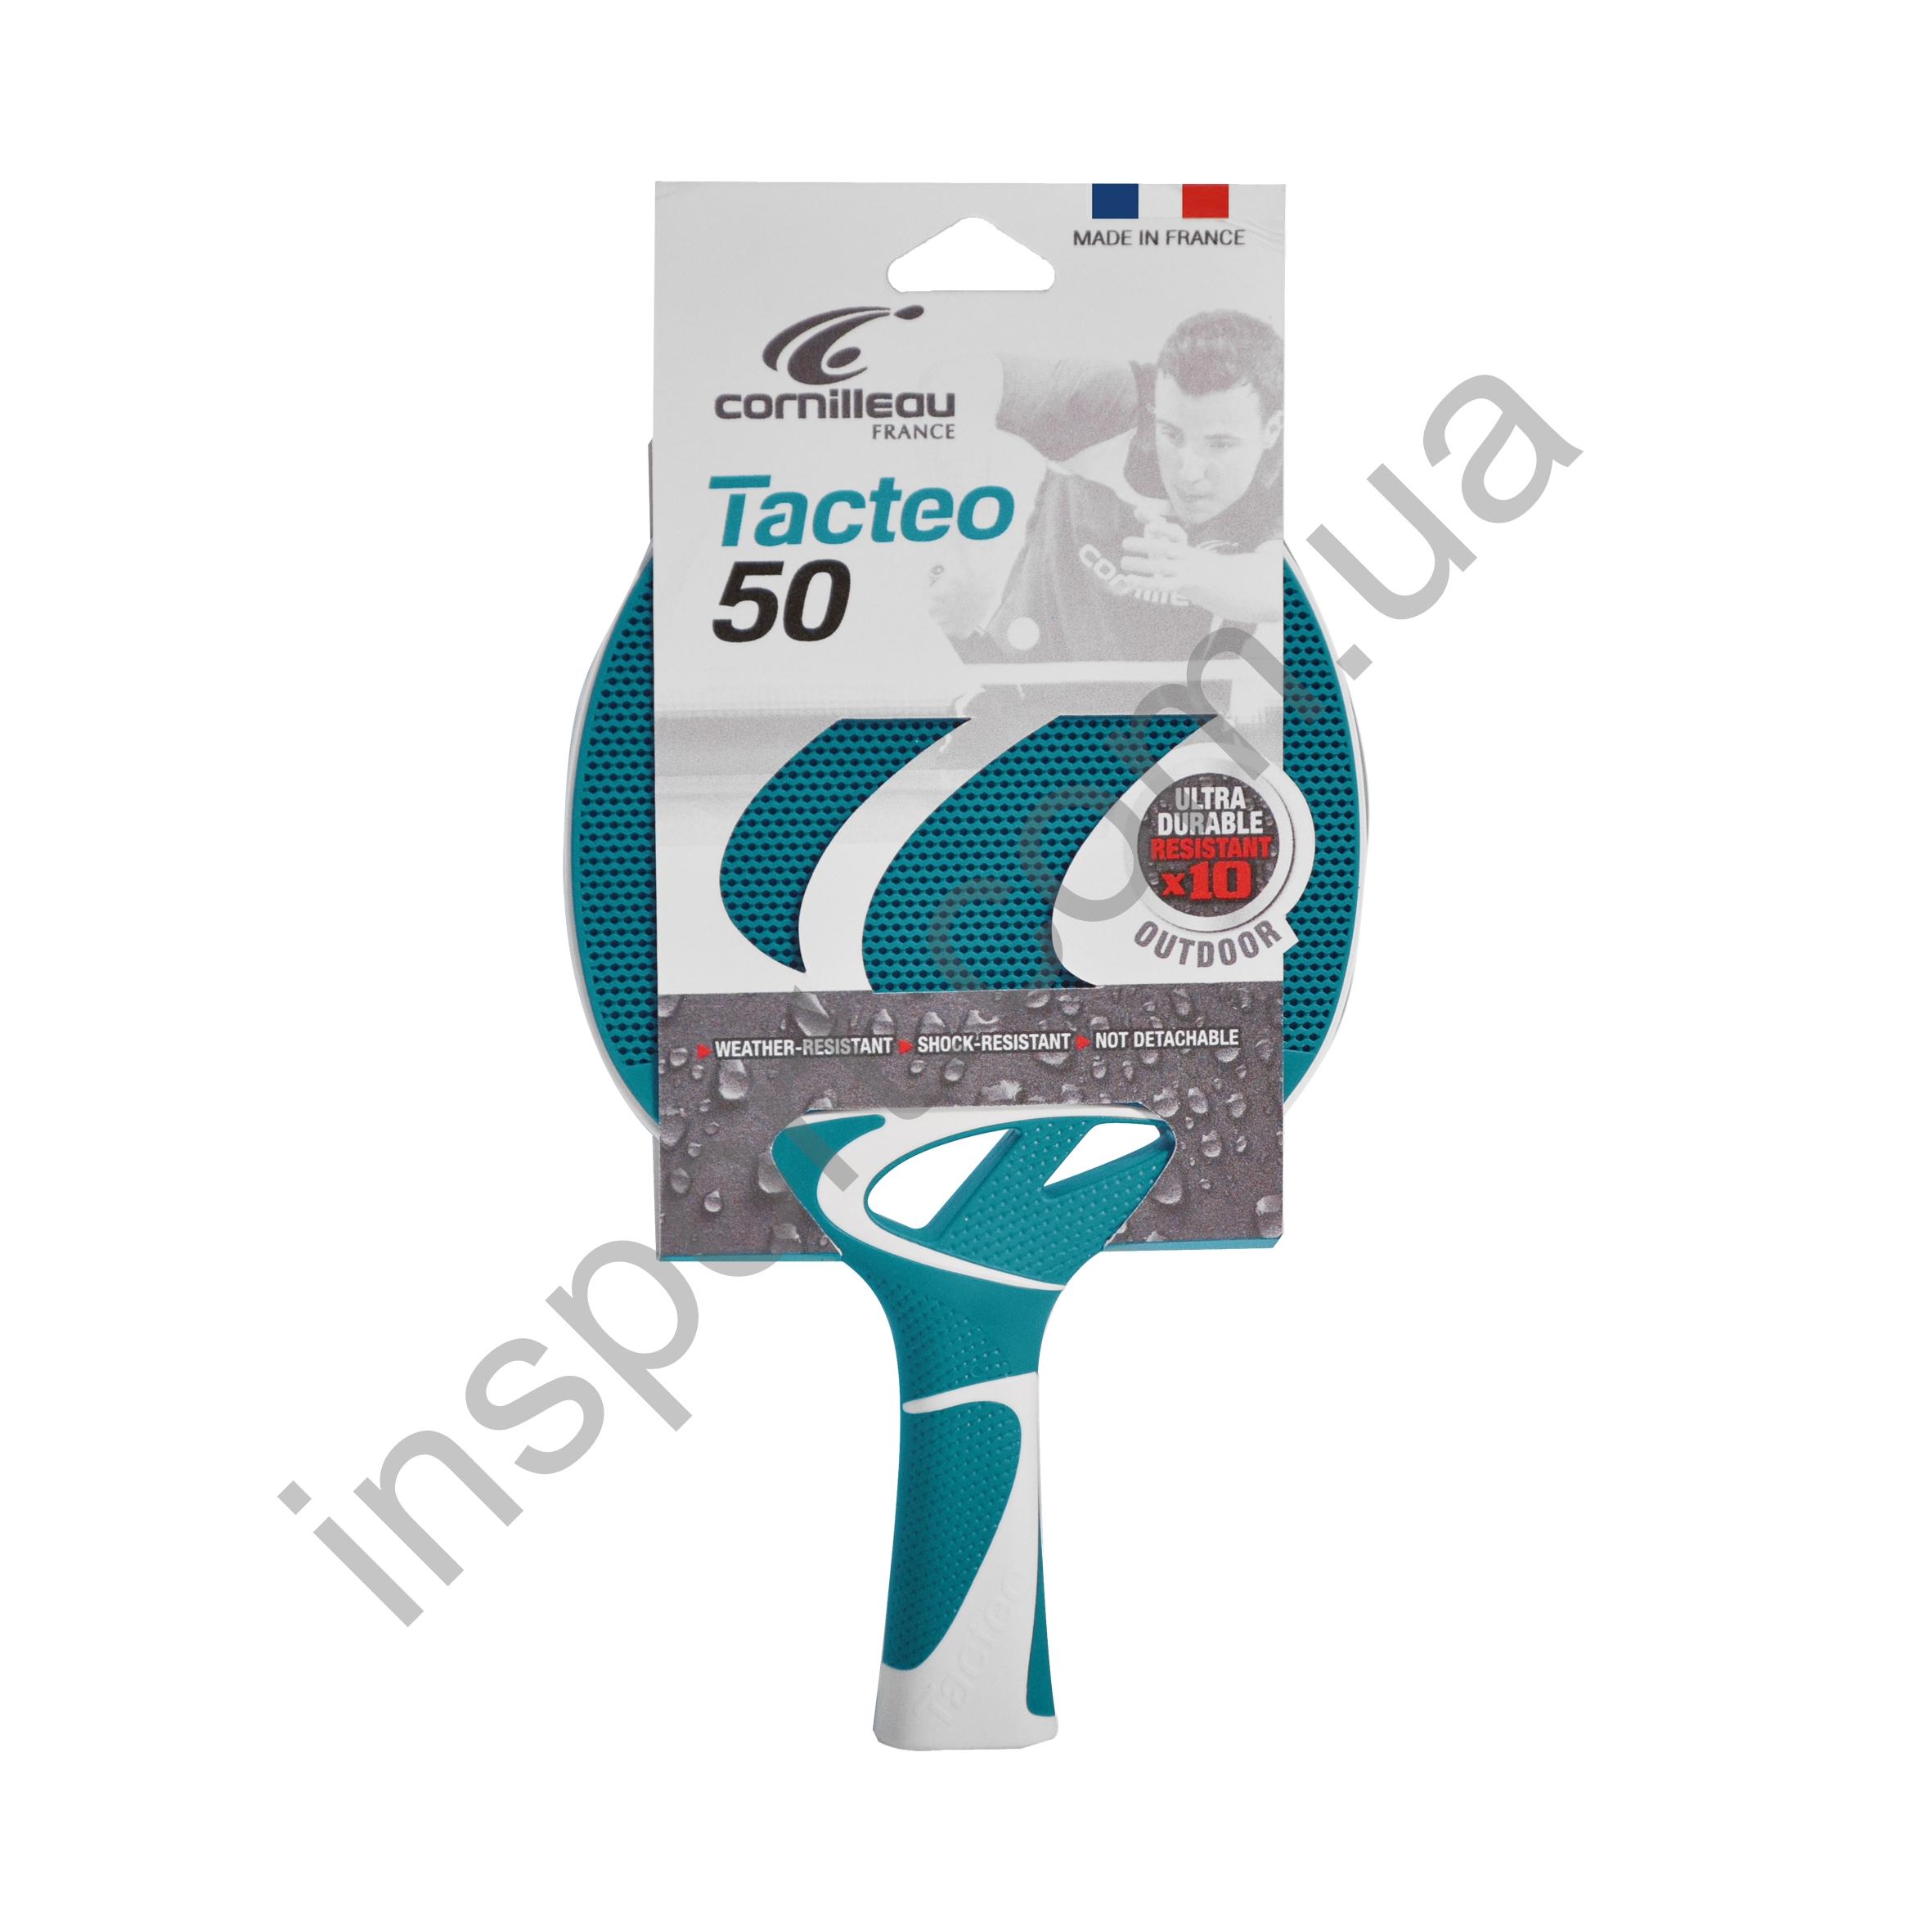 455405/455407/455408 Ракетка Cornilleau Tacteo 50 G3